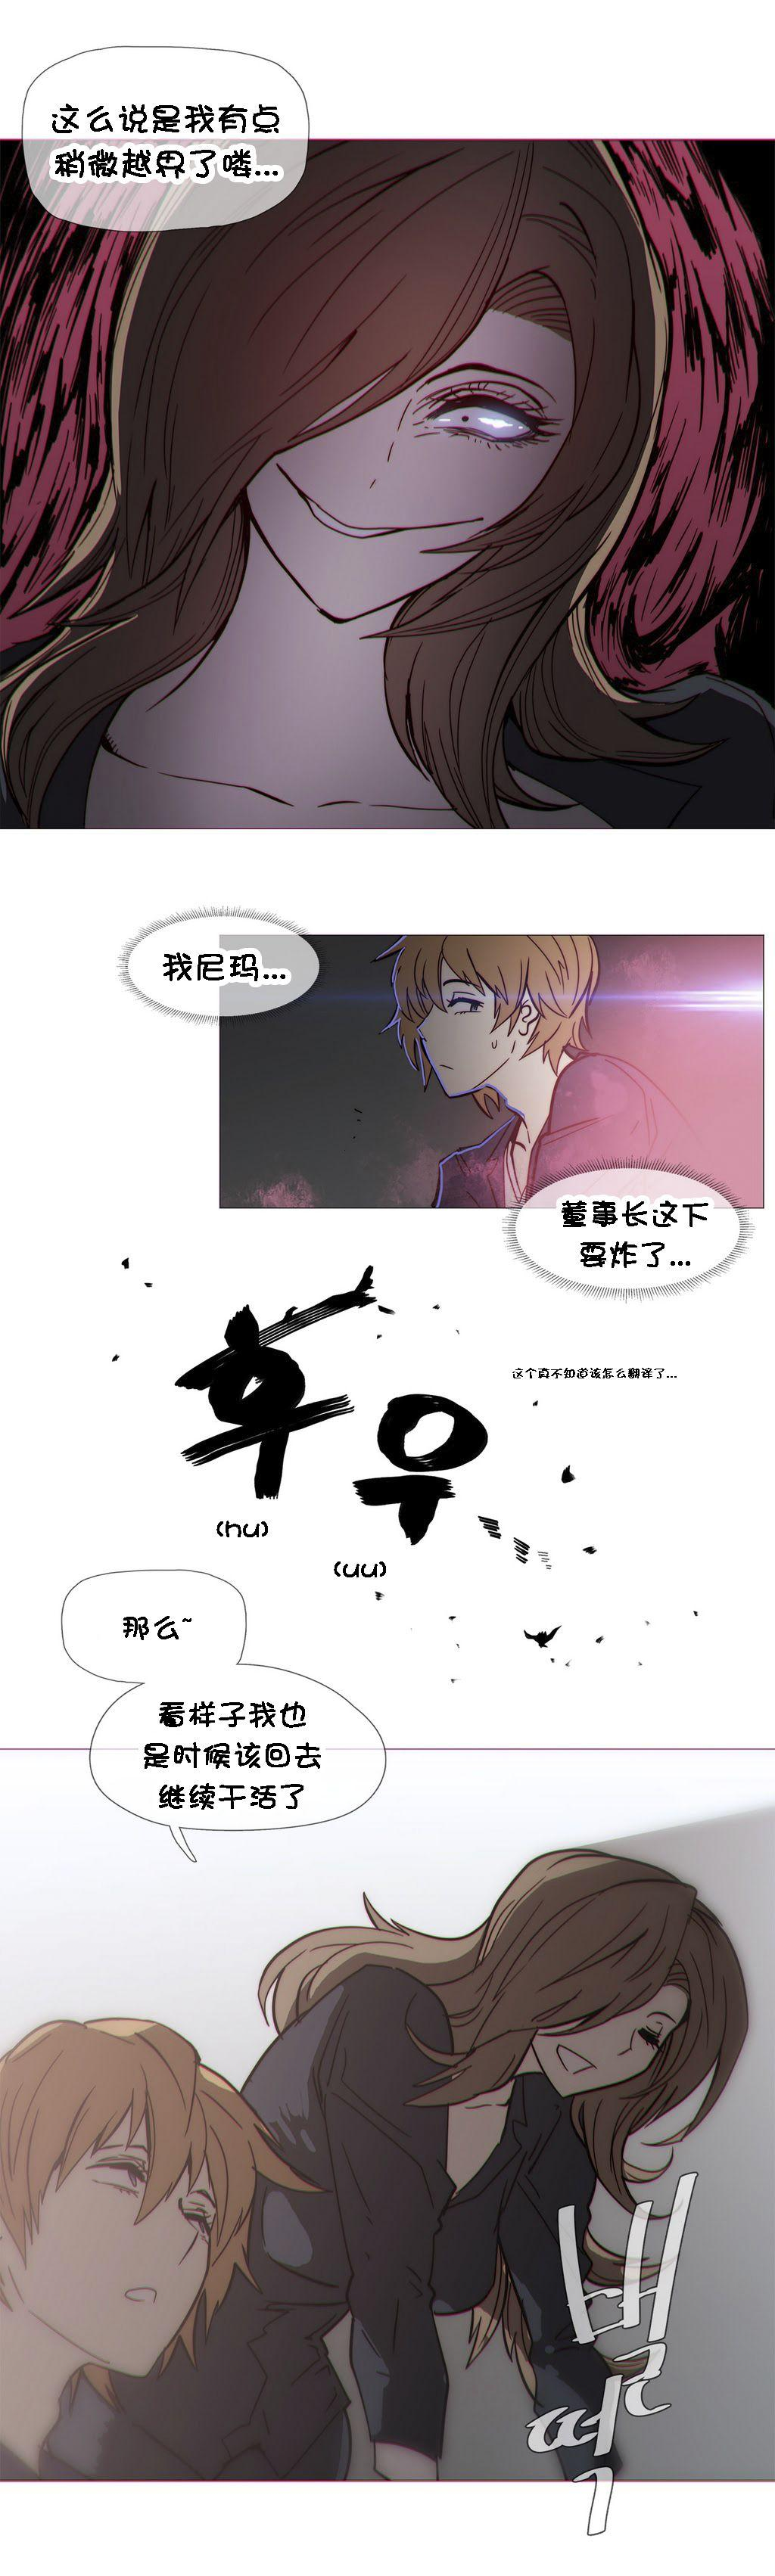 HouseHold Affairs 【卞赤鲤个人汉化】1~33话(持续更新中) 665